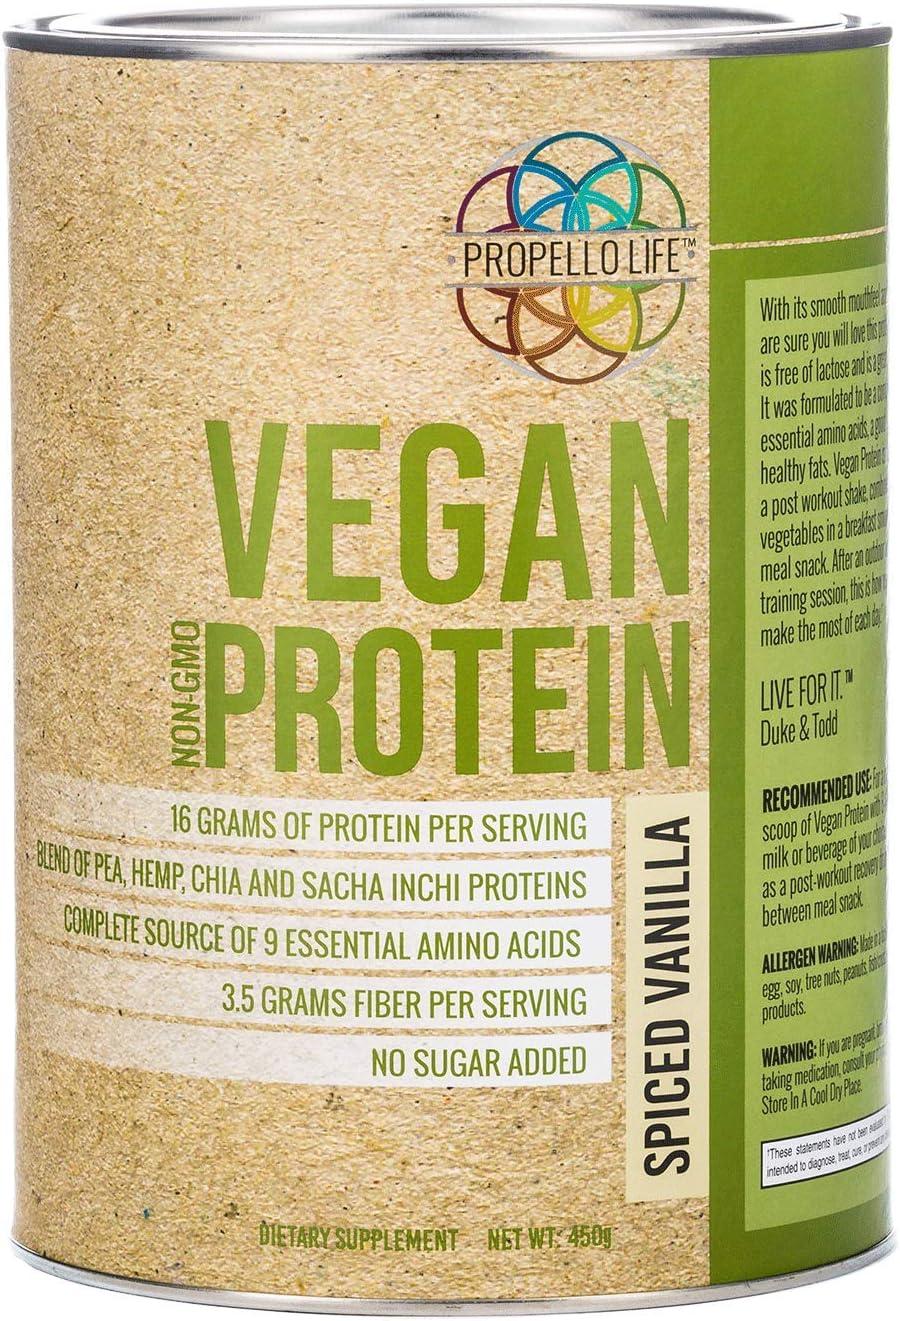 Propello Life Vegan Protein Powder, Spiced Vanilla, 450g